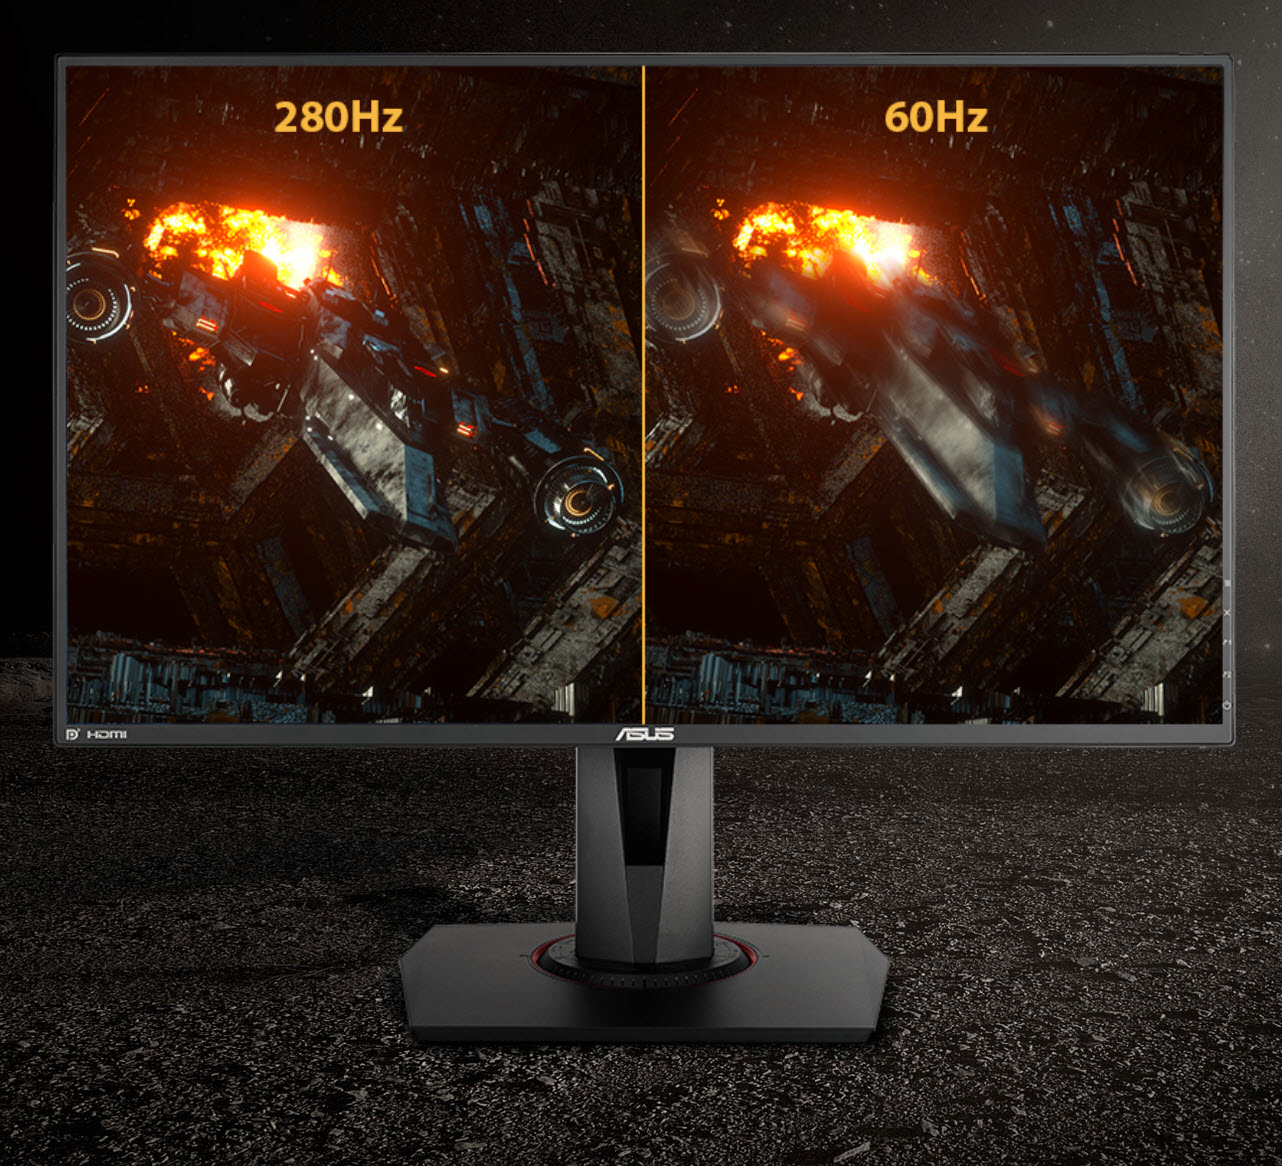 2020 04 03 14 52 32 ASUS เปิดตัว ASUS TUF Gaming VG279QM จอมอเกมส์มิ่งนิเตอร์มาพร้อมหน้าจอภาพ IPS รีเฟรชเรตสูงถึง 280Hz กันเลยทีเดียว